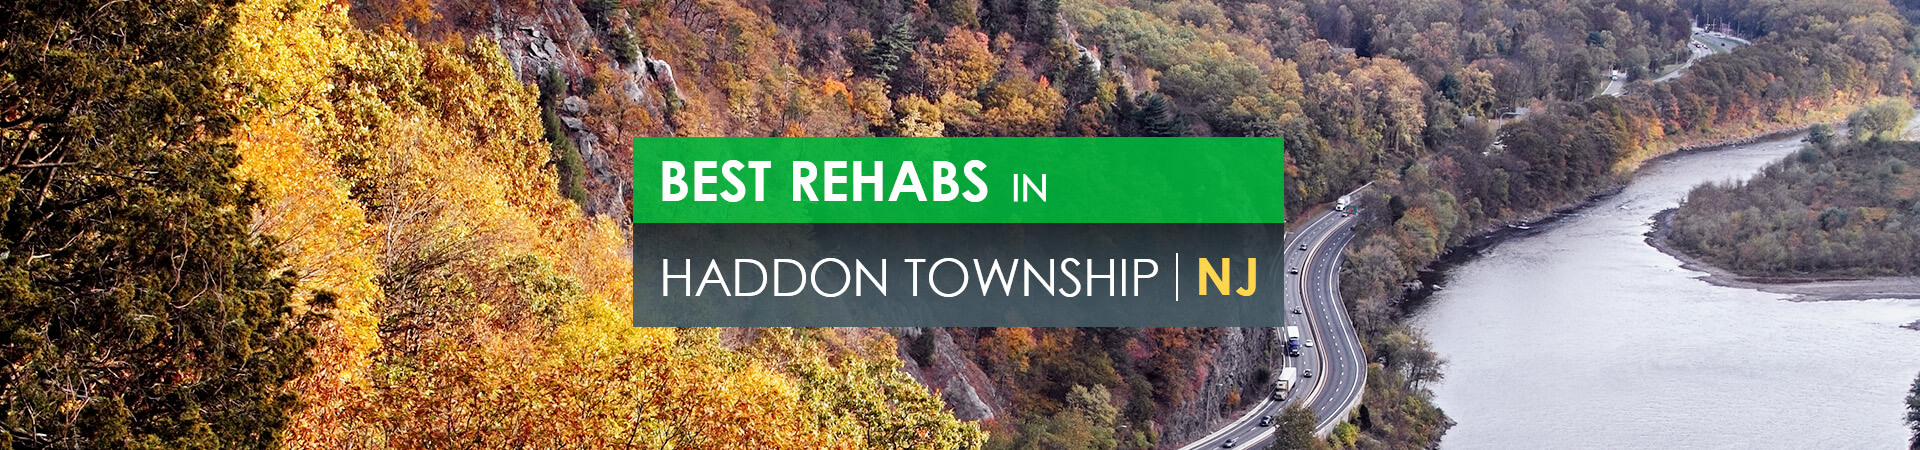 Best rehabs in Haddon Township, NJ